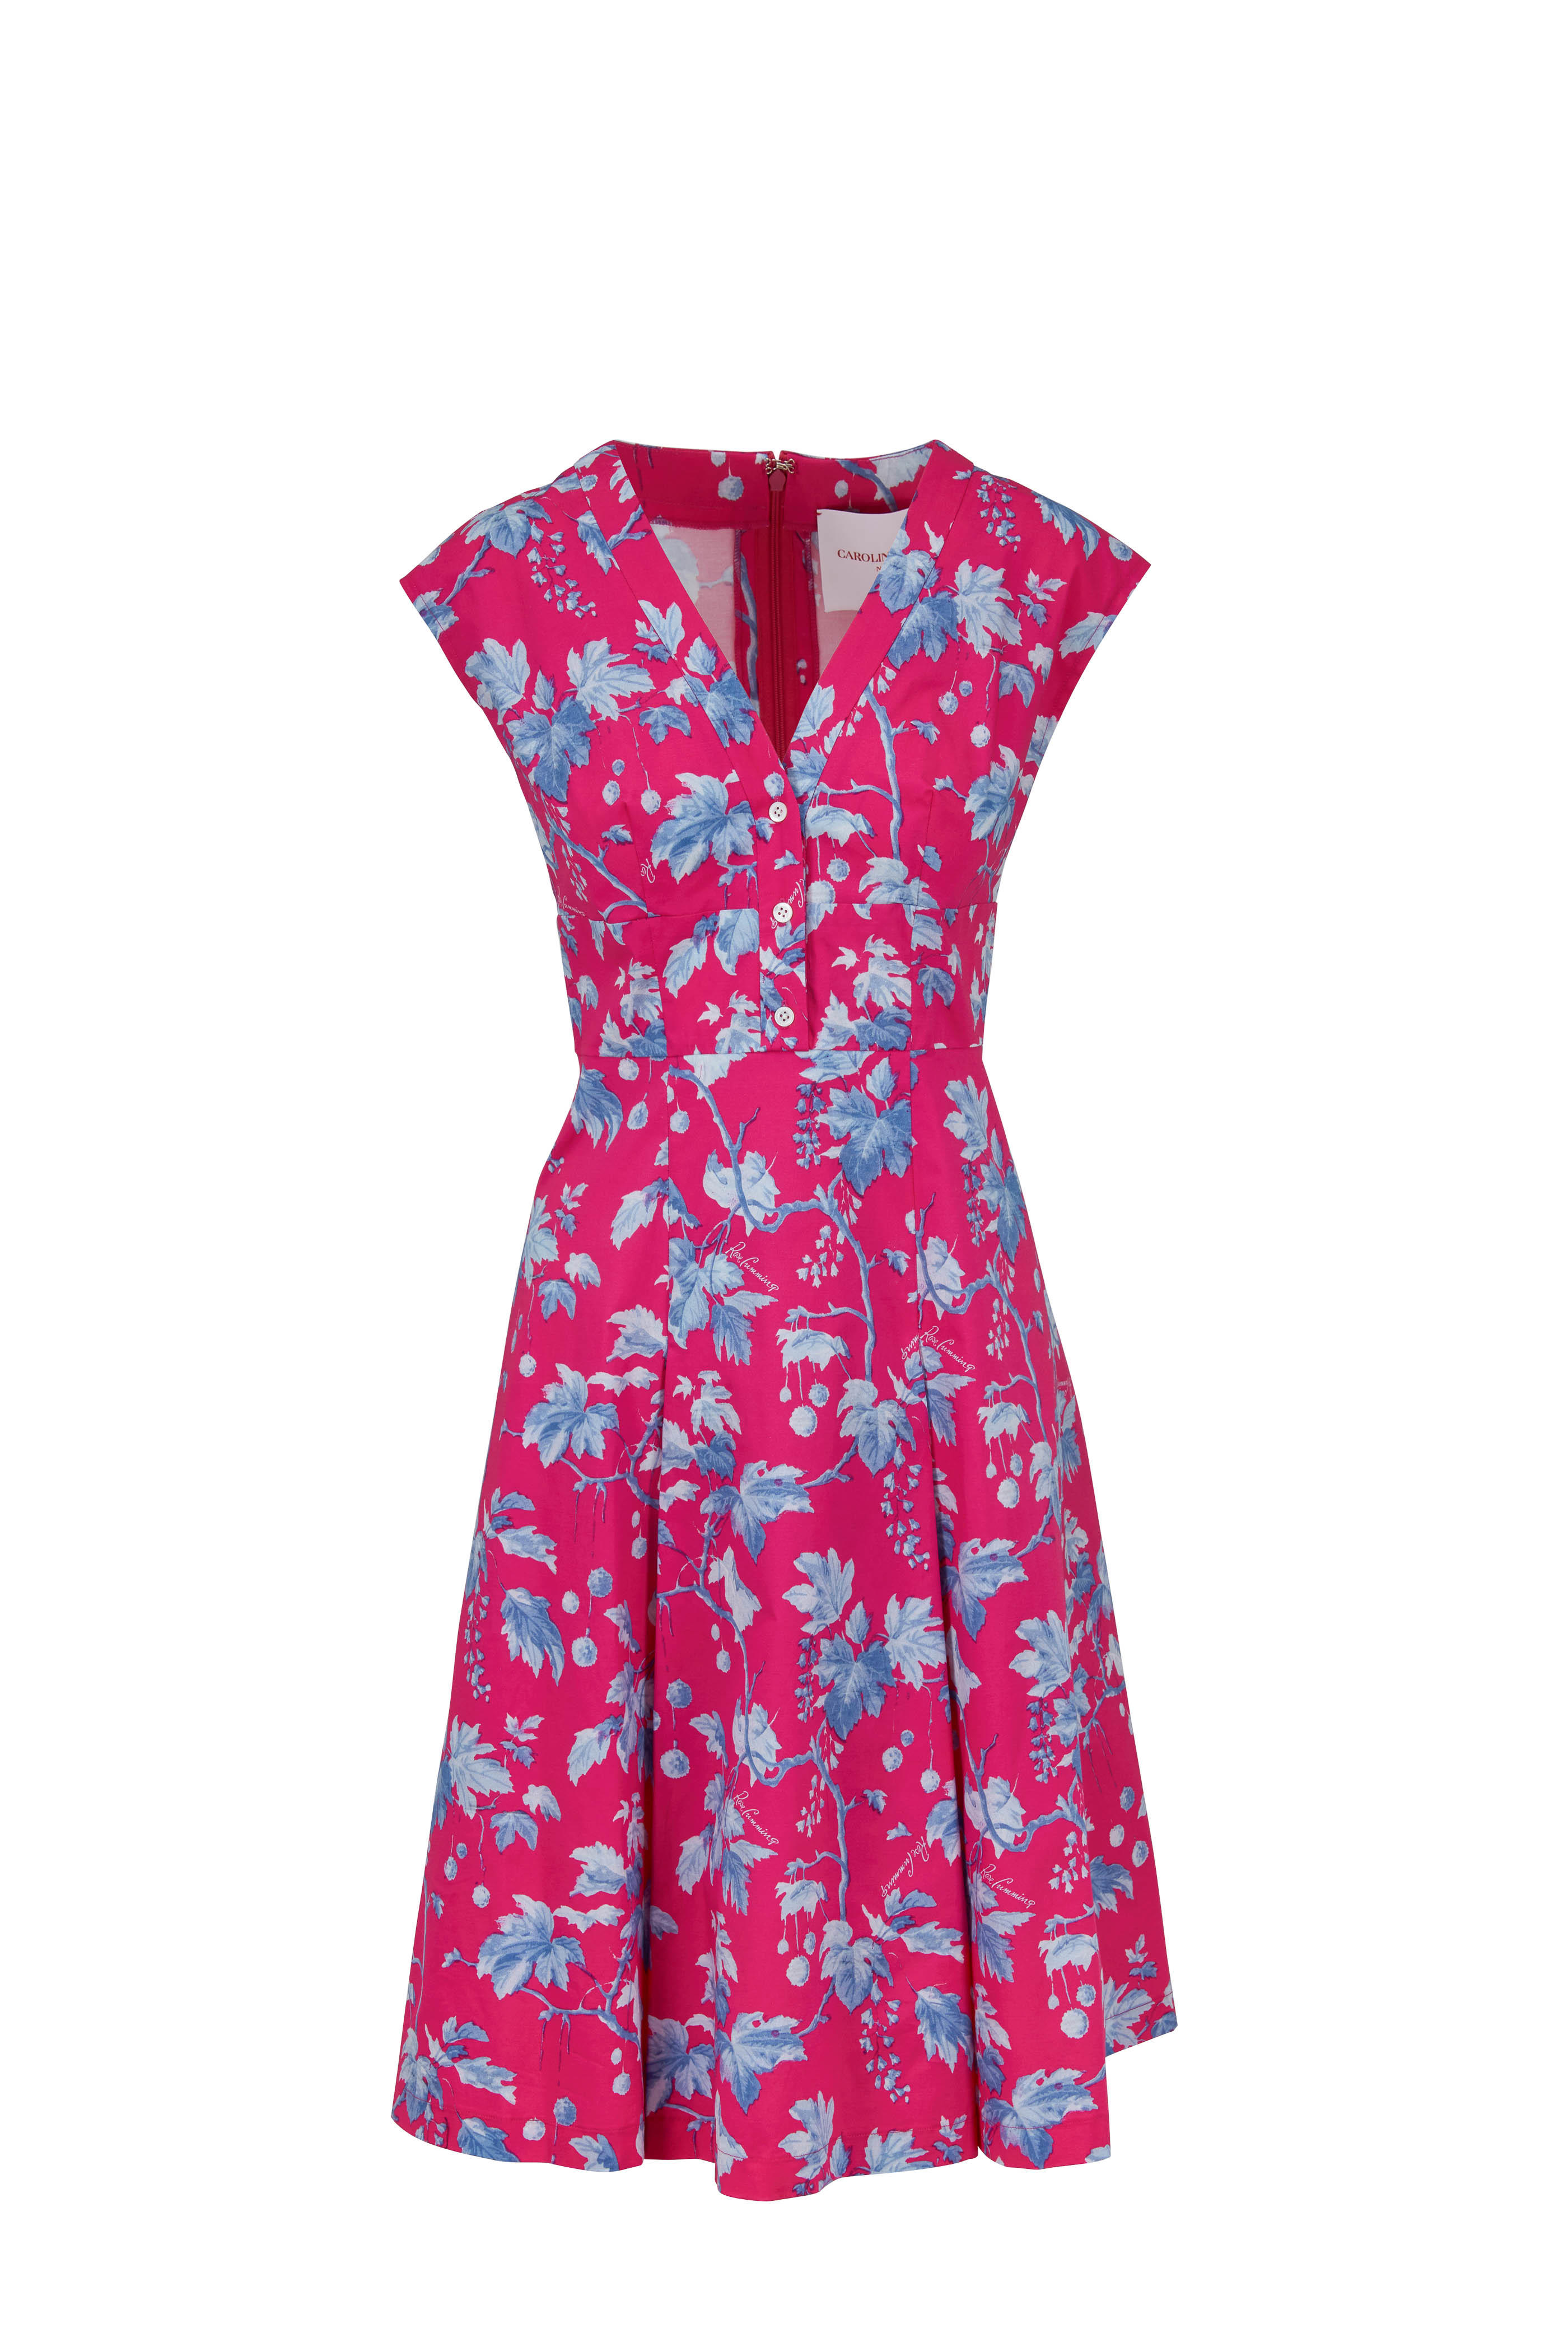 891f3cd499a0a Carolina Herrera - Pink Multi Print Stretch Poplin Cap Sleeve Dress ...